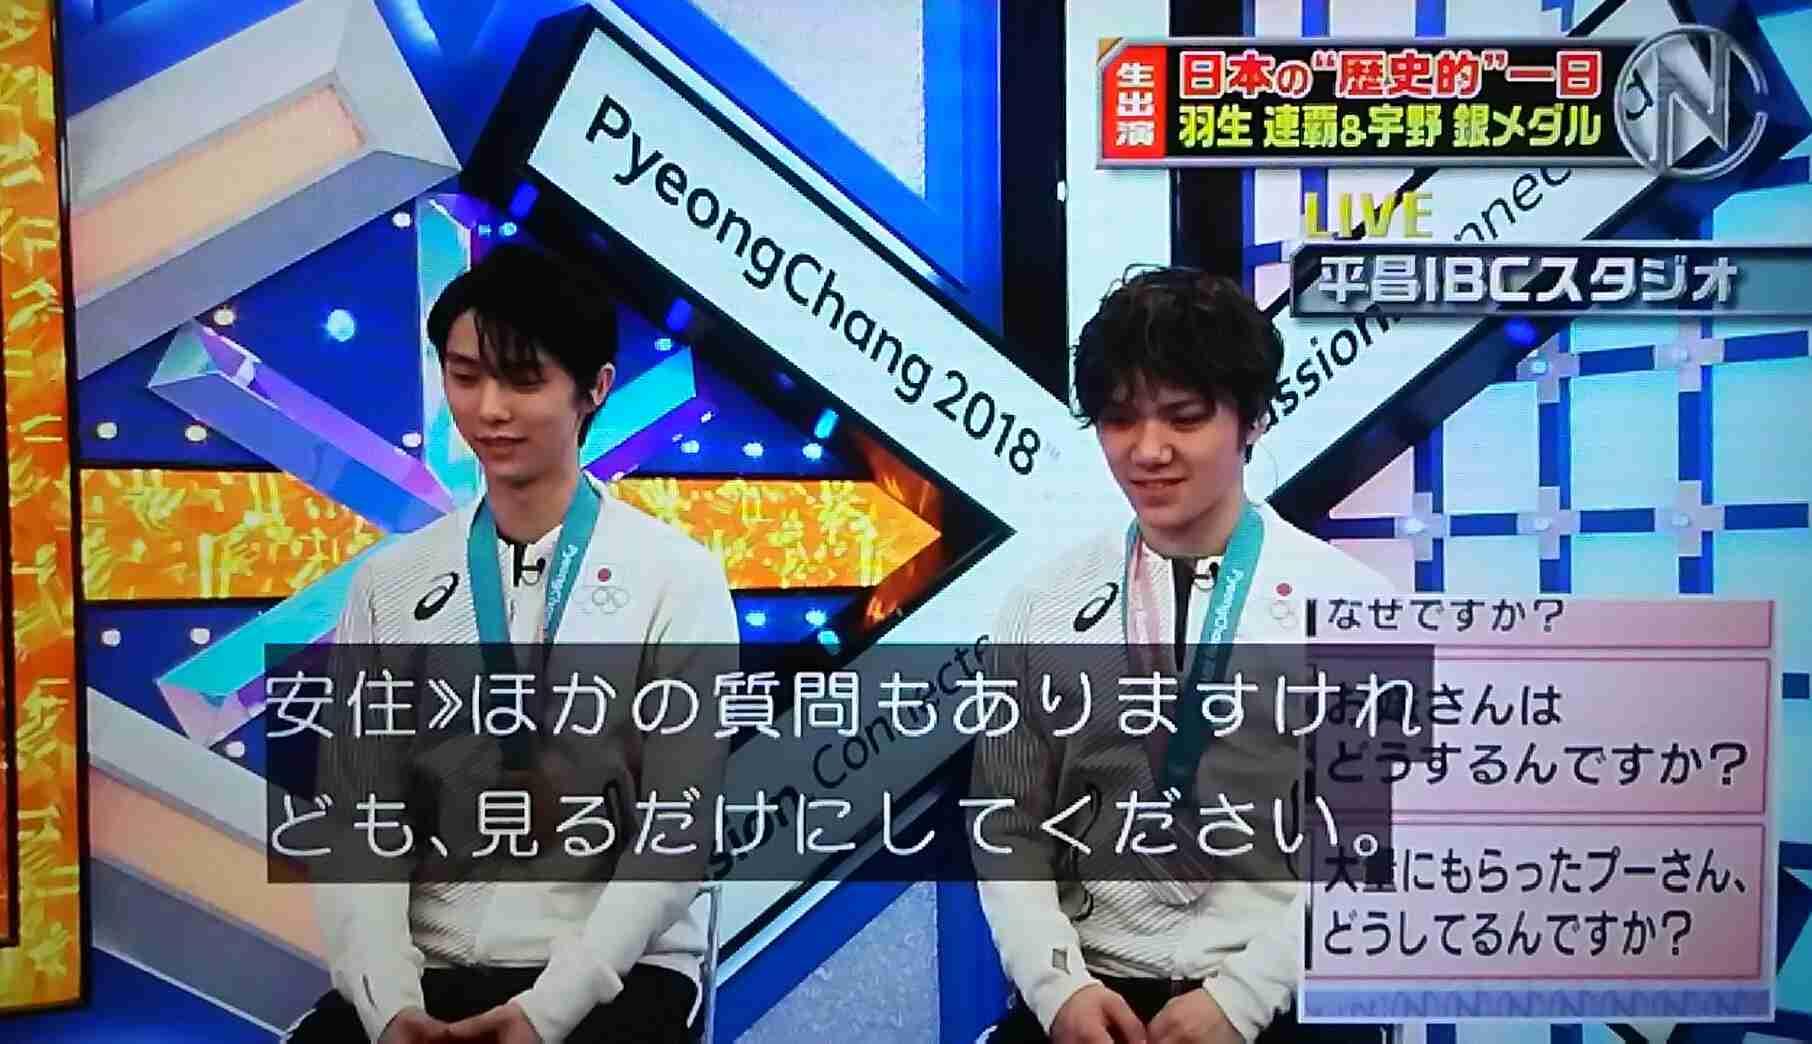 TBS安住紳一郎アナ、羽生結弦への結婚質問さばき「好感度爆上げ」